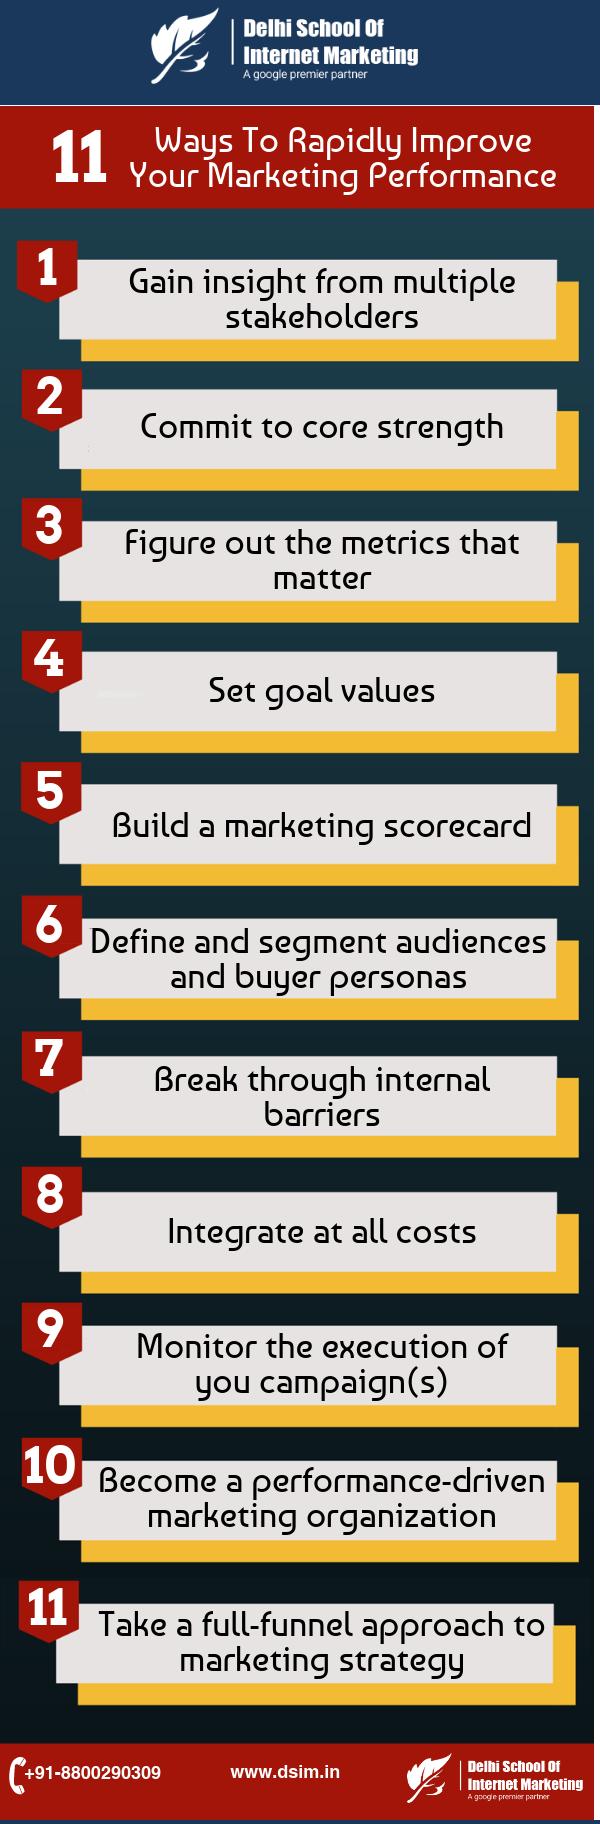 marketing-performance-dsim-dsim